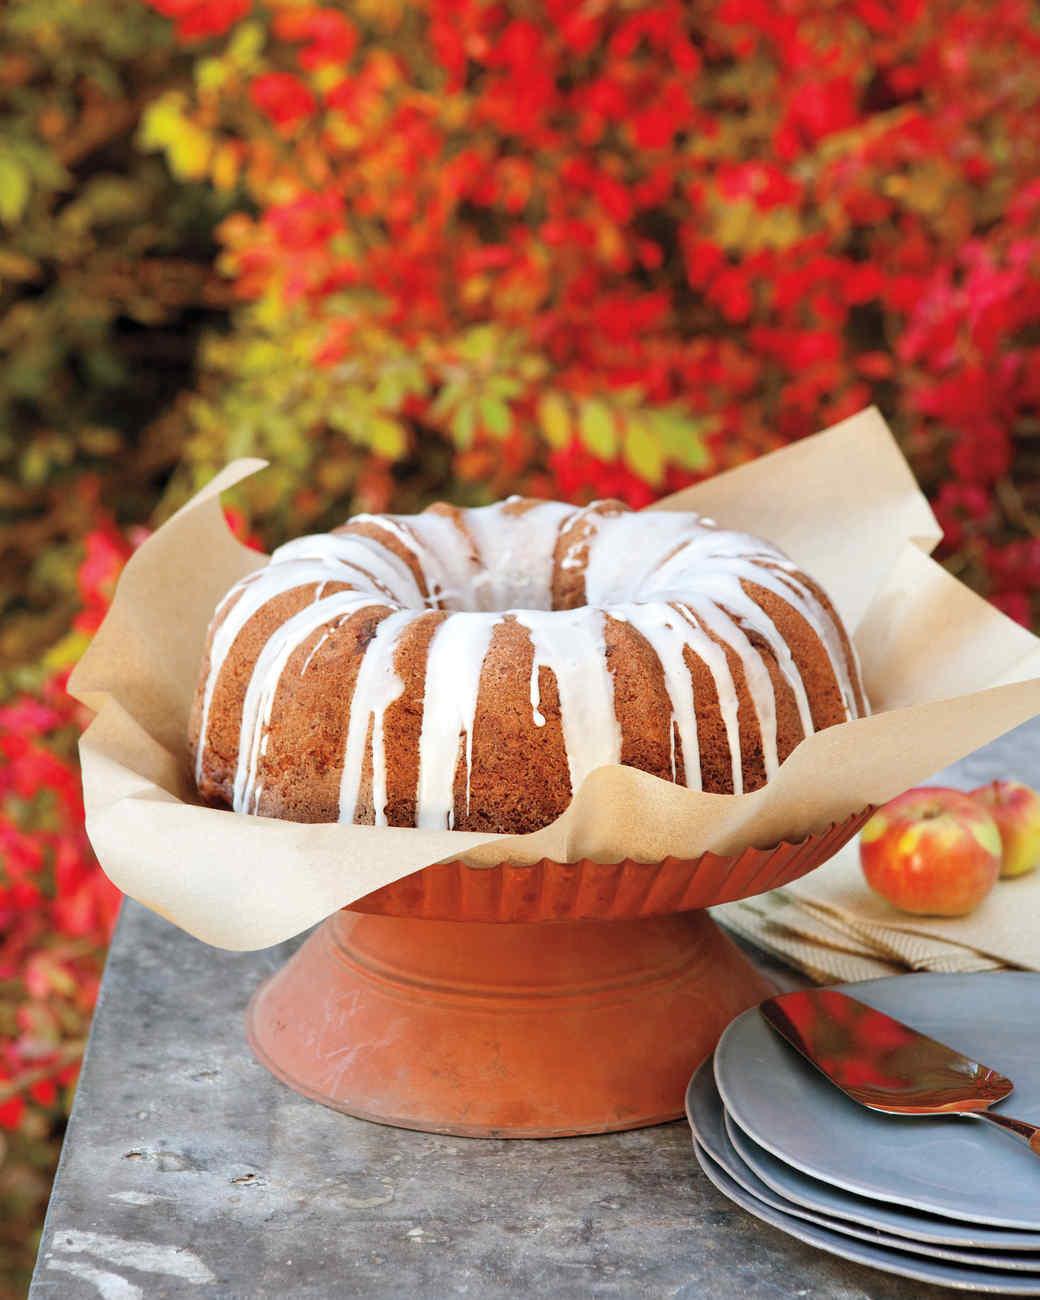 bundt-cake-1011mld106819.jpg